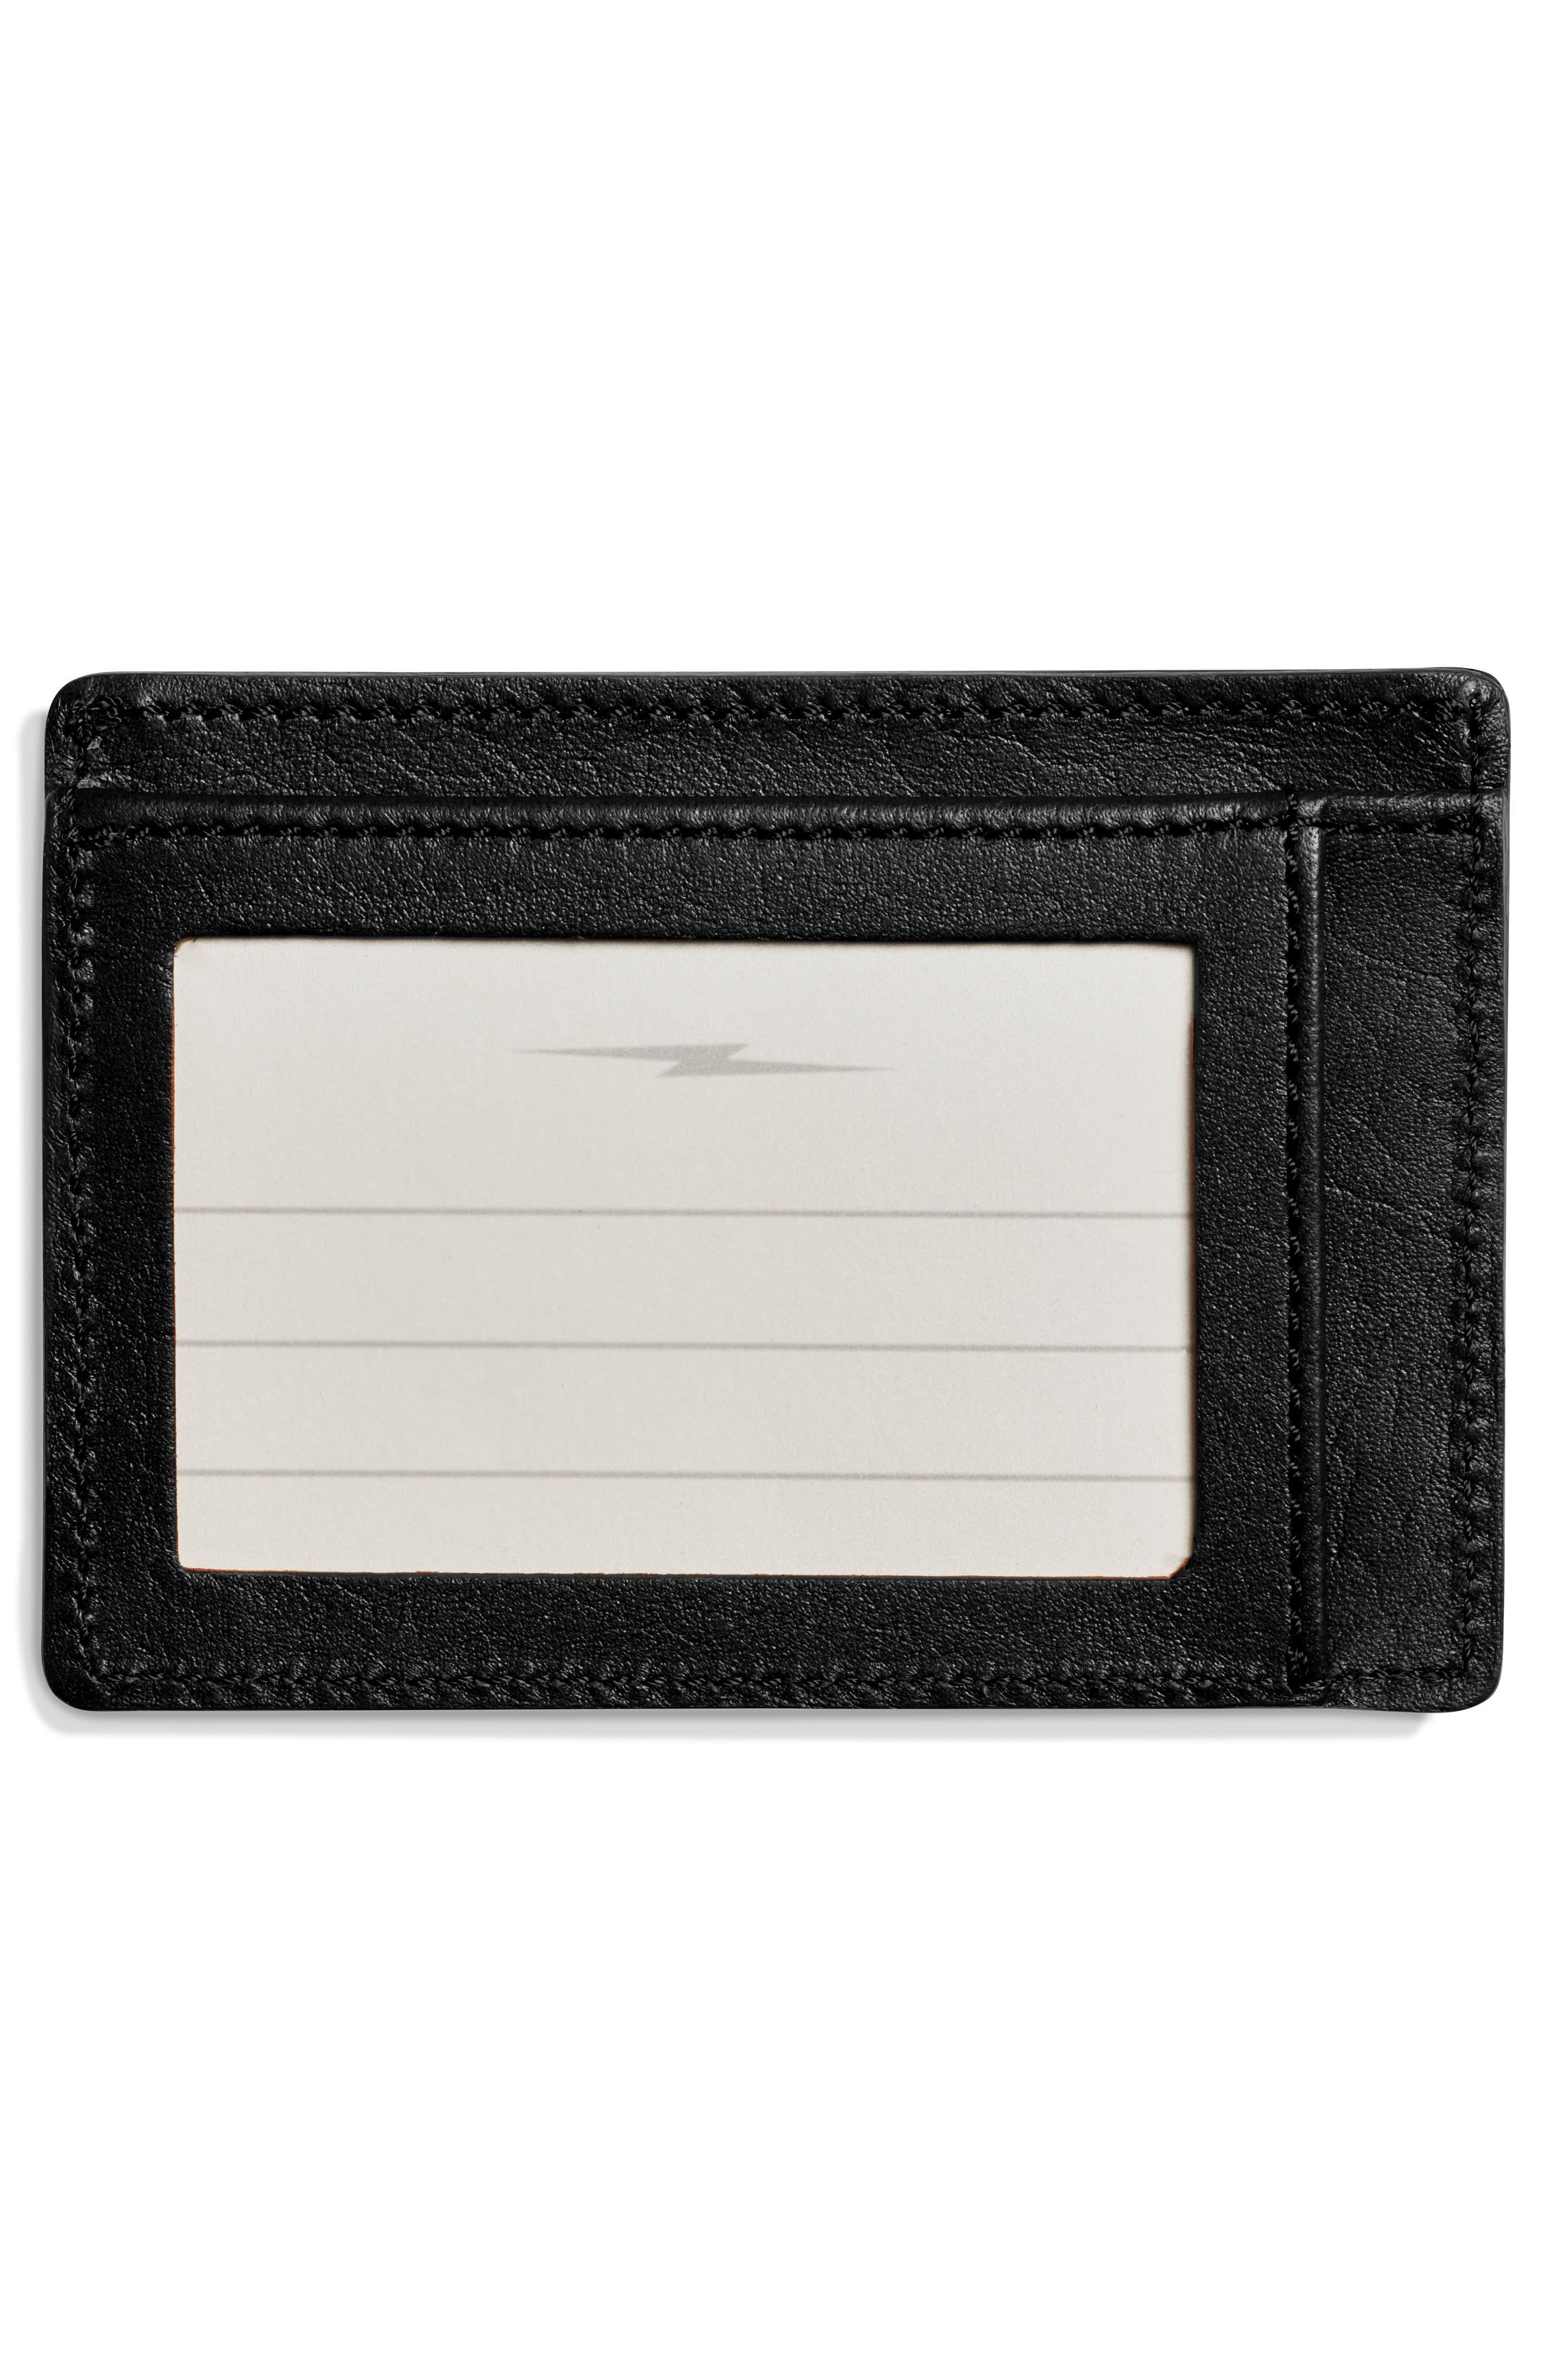 Leather Card Case,                             Alternate thumbnail 2, color,                             Black